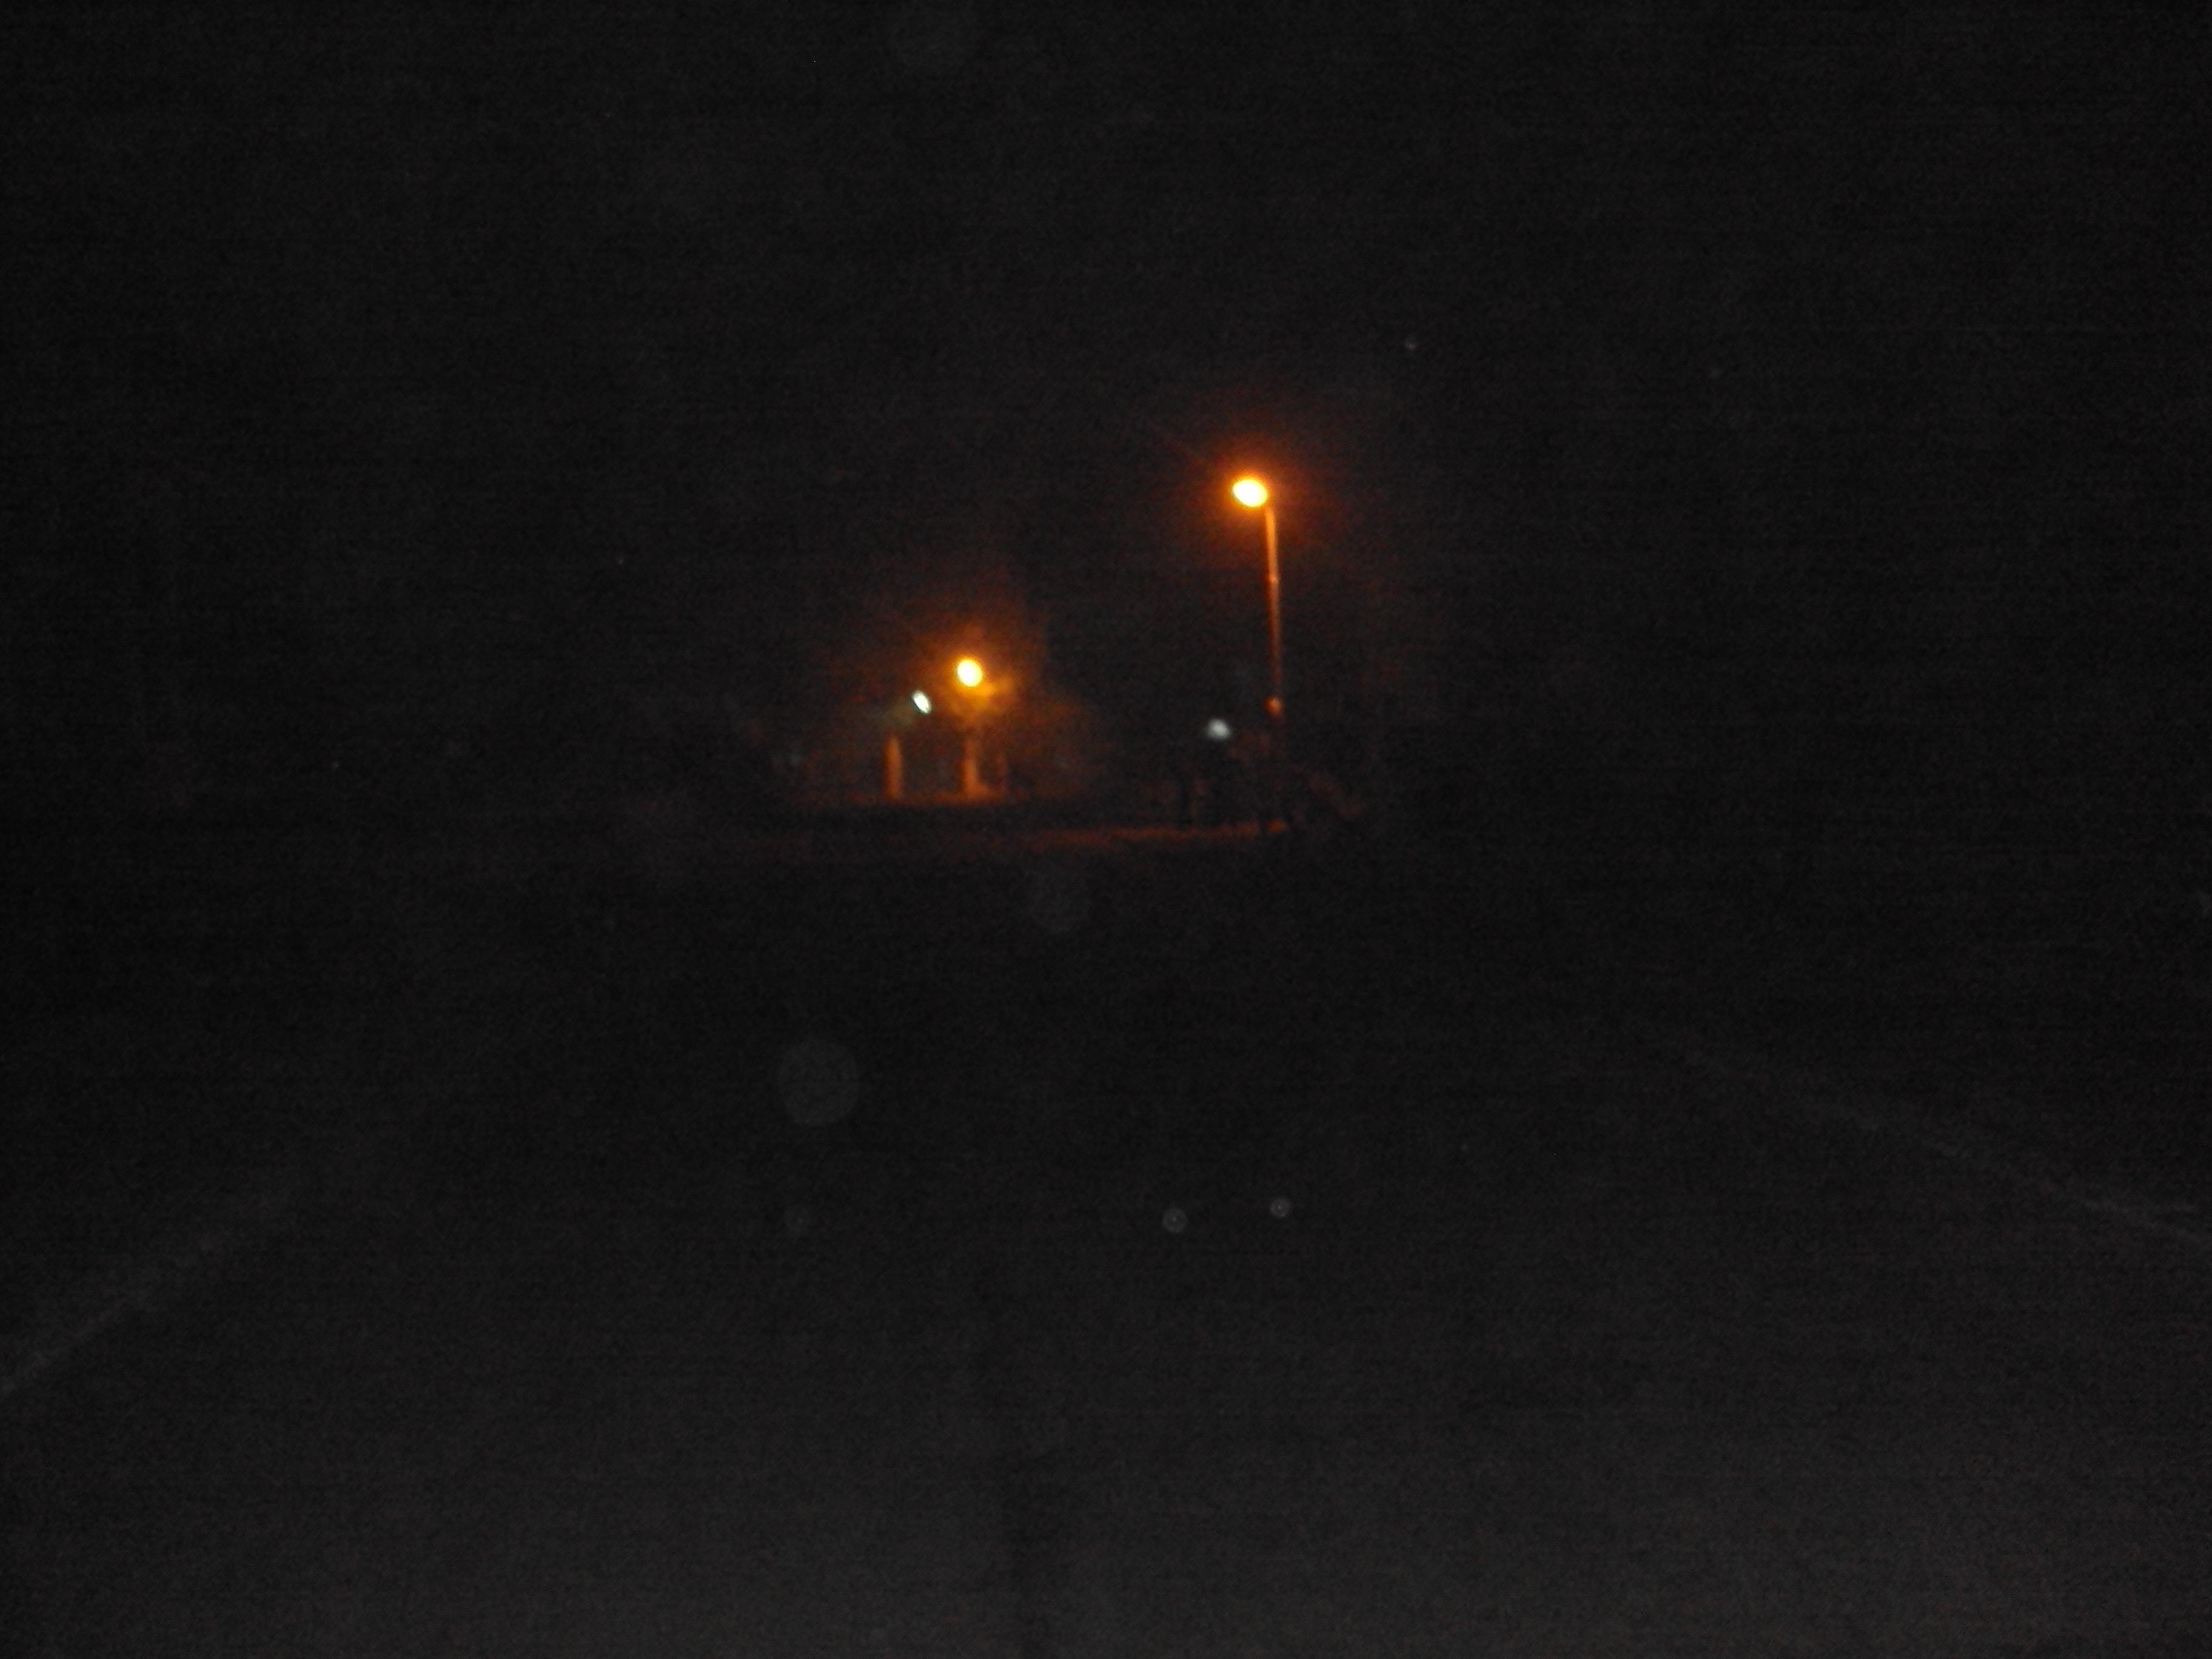 Dsc Dark Lonely Night